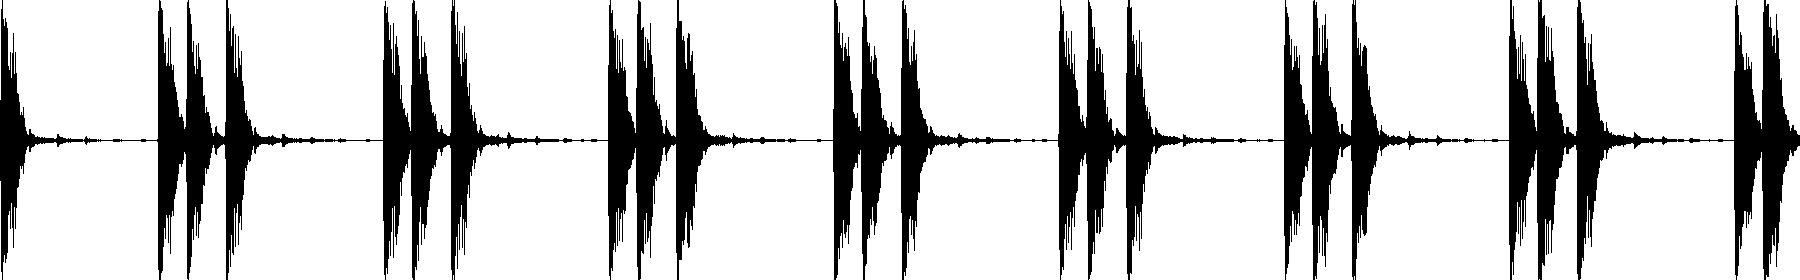 vedh melodyloop 051 f g d 124bpm